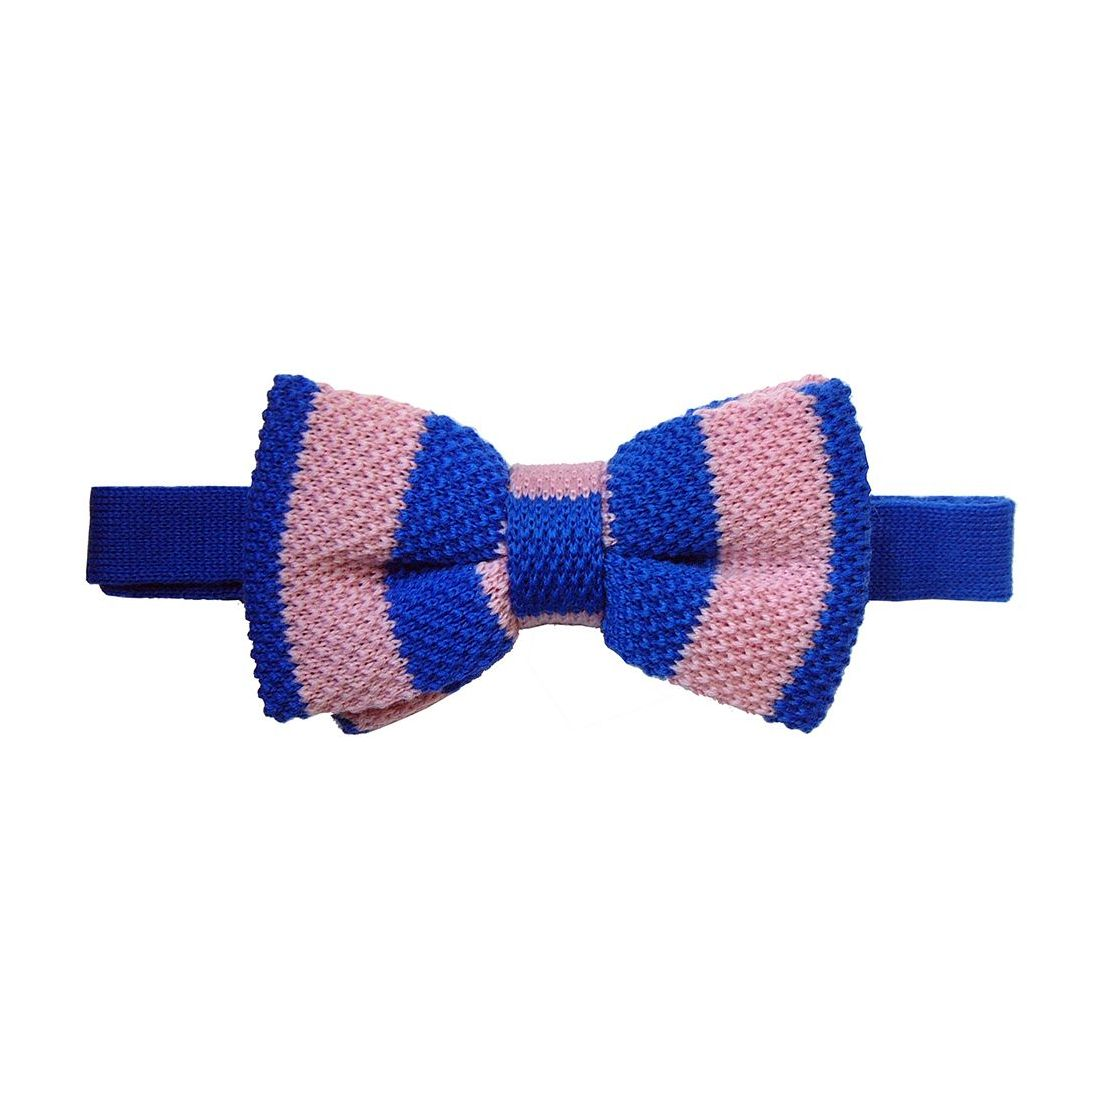 noeud papillon tricot laine club bleu et rose tyler tyler noeu. Black Bedroom Furniture Sets. Home Design Ideas